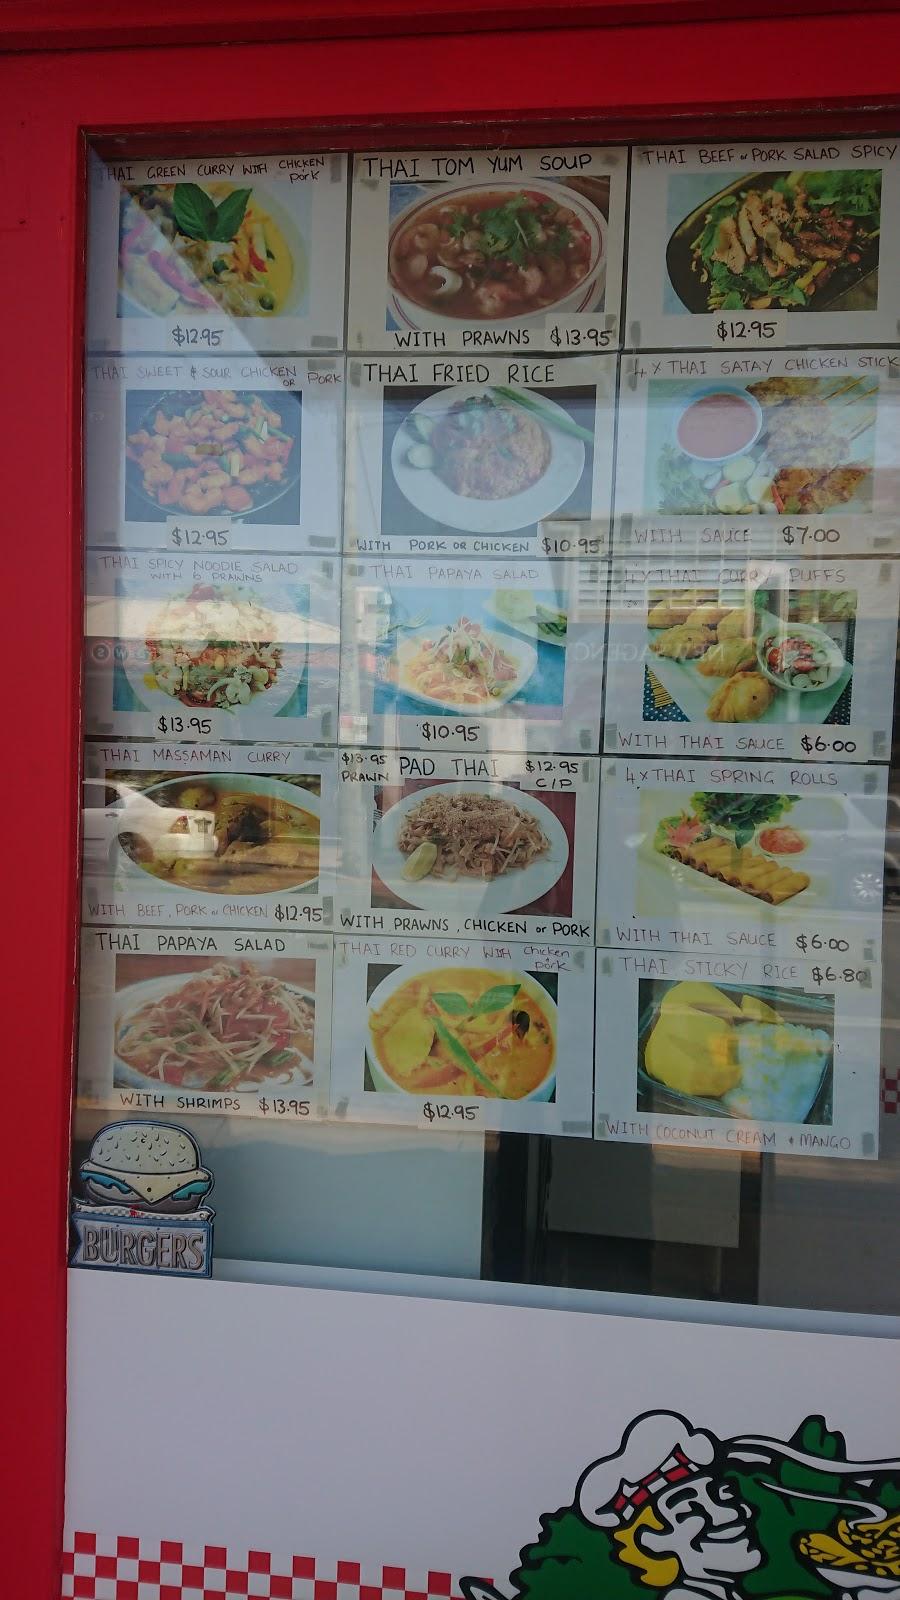 Yum Thai And Kiwi Roast | restaurant | 26 Musgrave Ave, Southport QLD 4215, Australia | 0756396901 OR +61 7 5639 6901